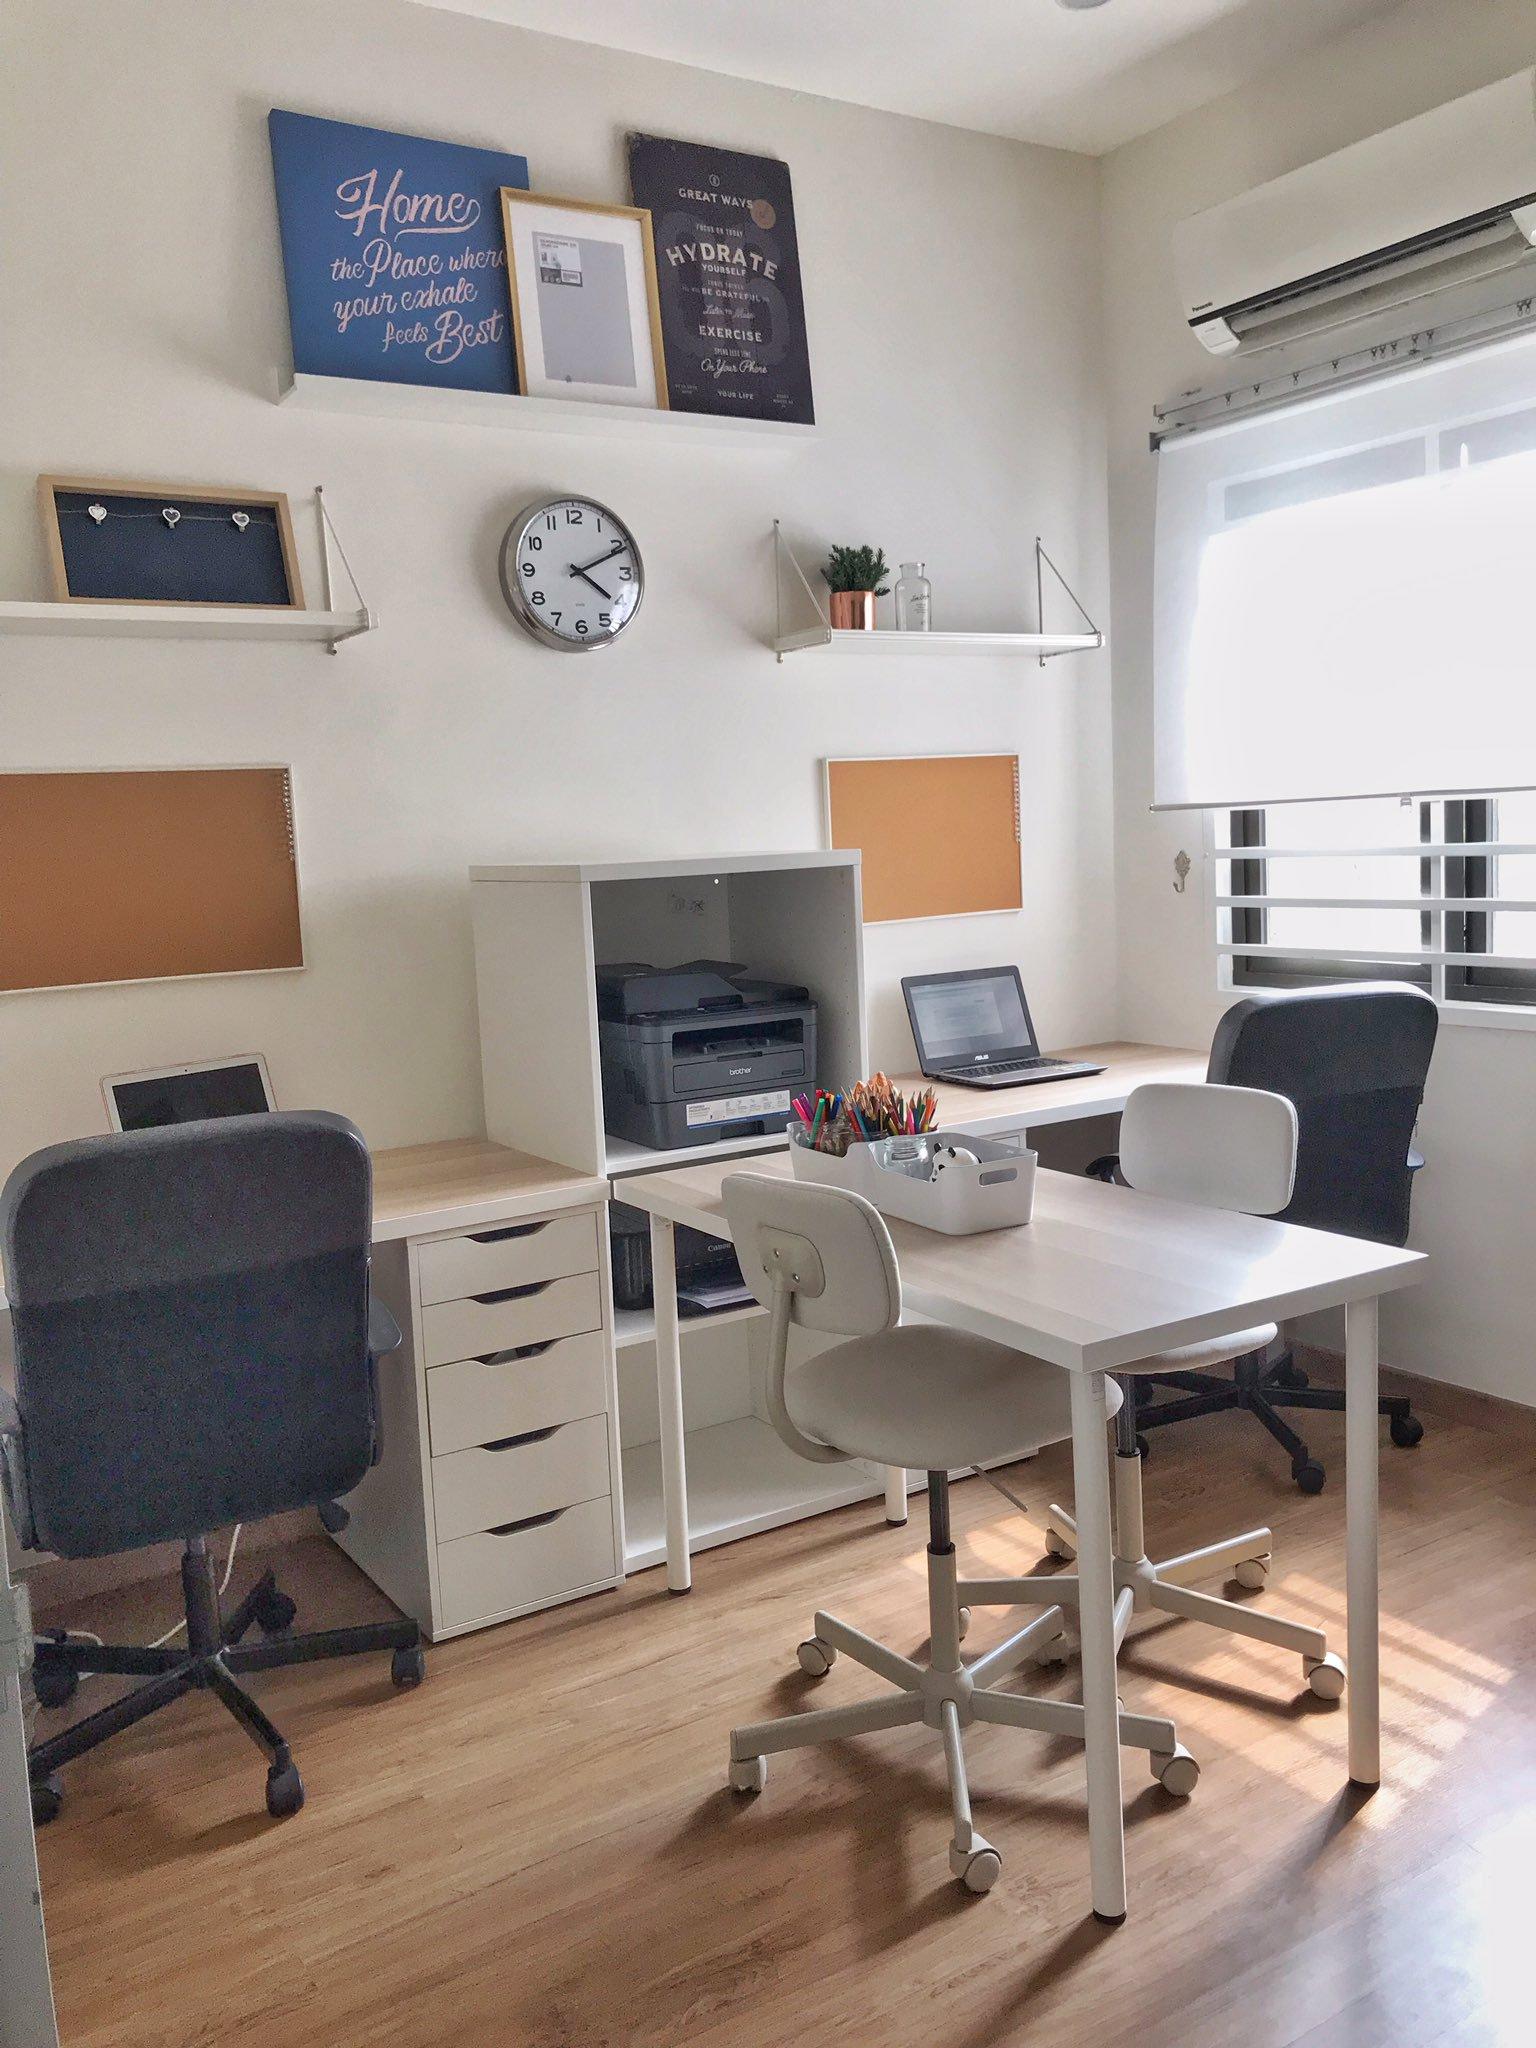 Naikkan Mood Suami Ambil Master, Lihat Deko Mewah 'Study Room' Oleh Doktor Ini